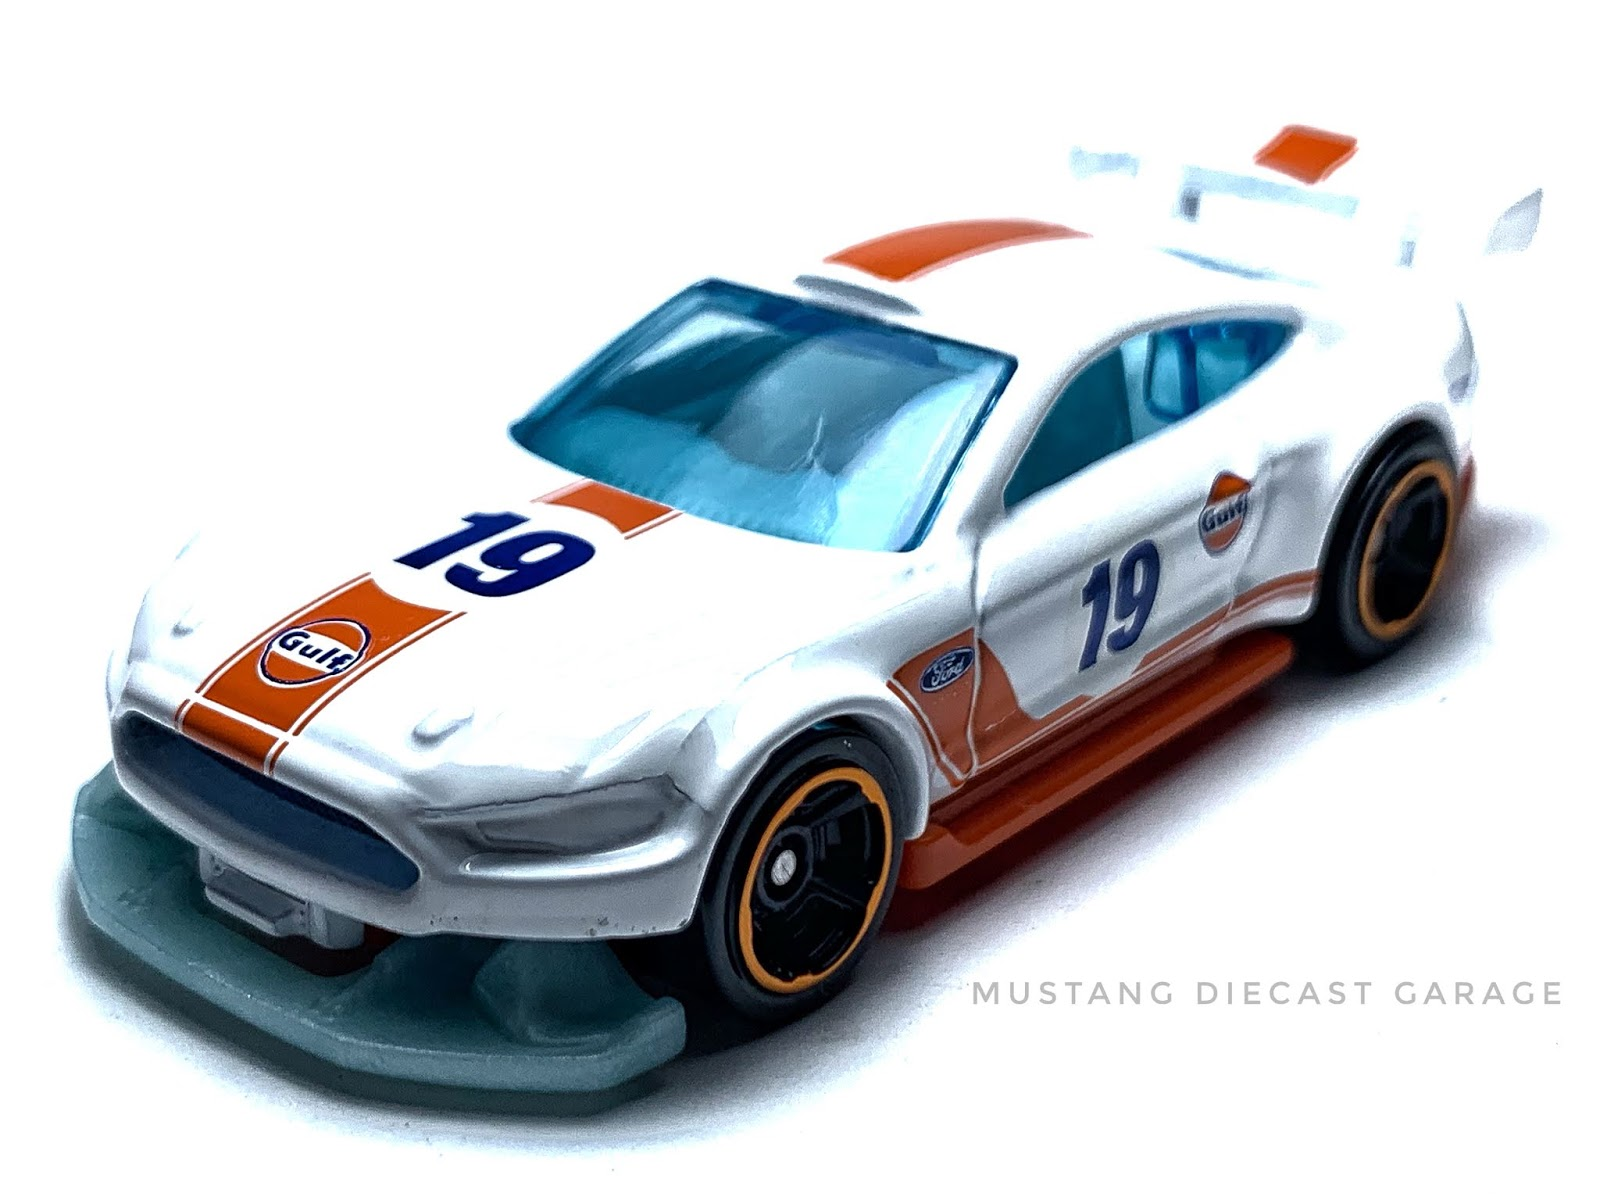 Mini GT 1:64 Lb funciona Nissan Gt-r R35 40th intersport Indonesia dólar rodesiano